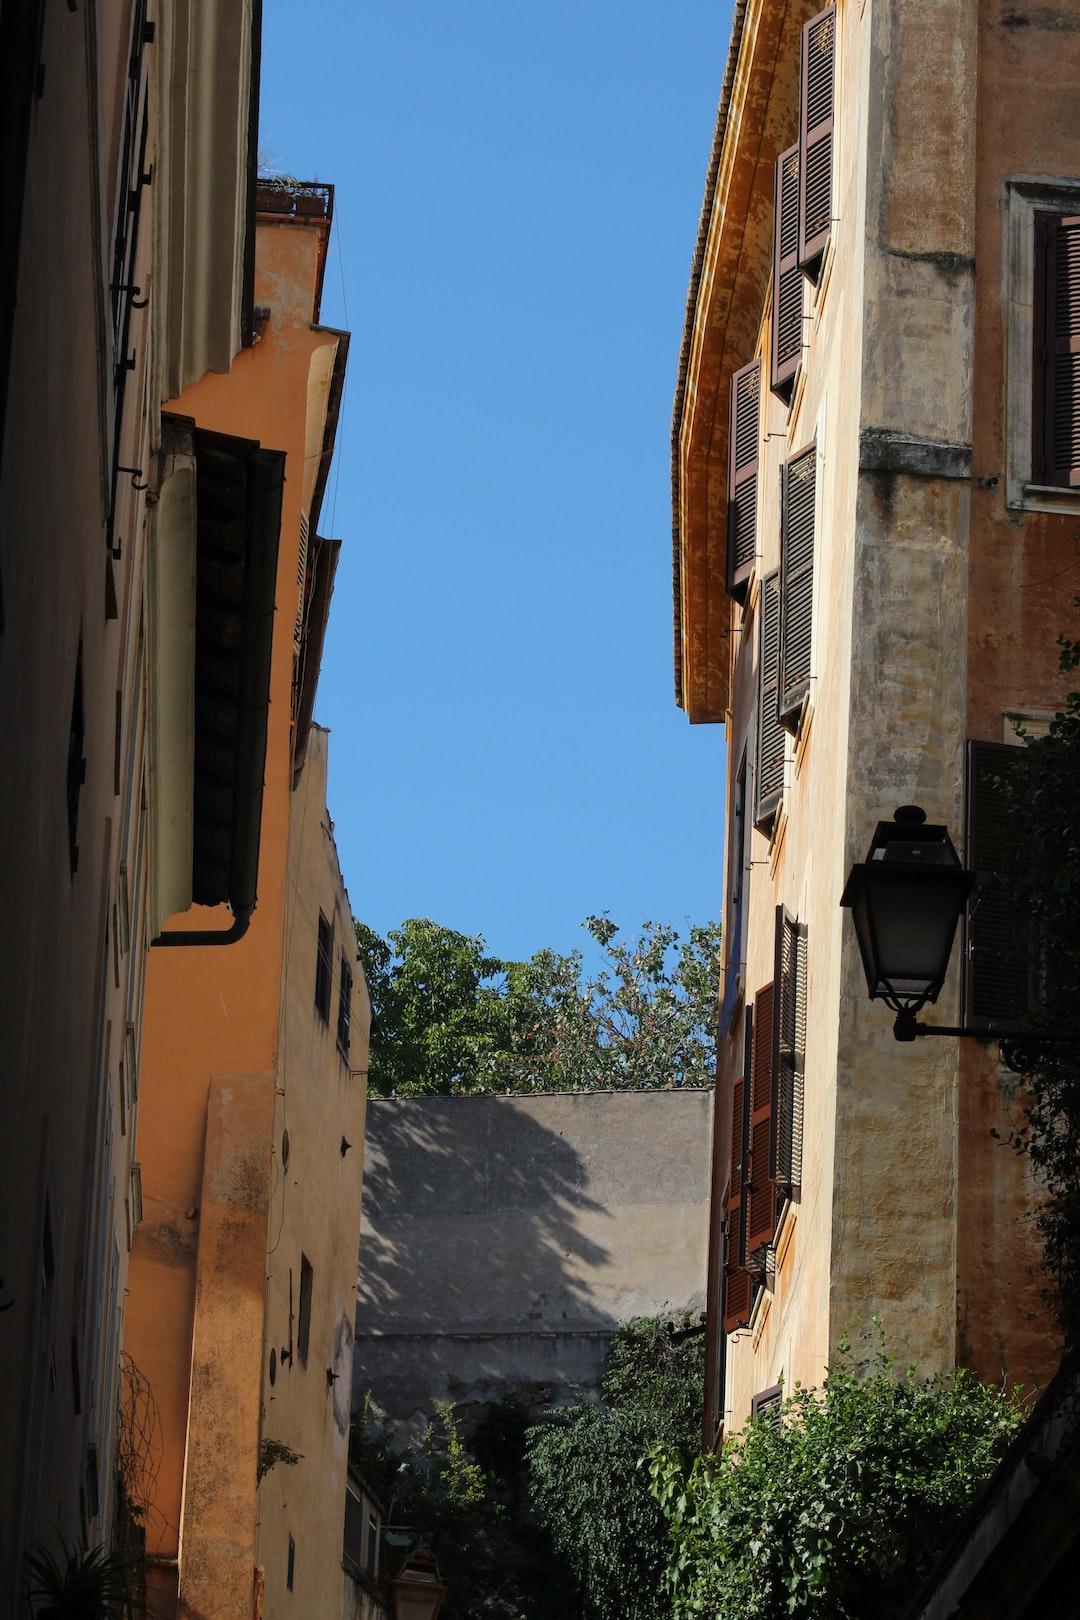 Street view, Rome, Italy